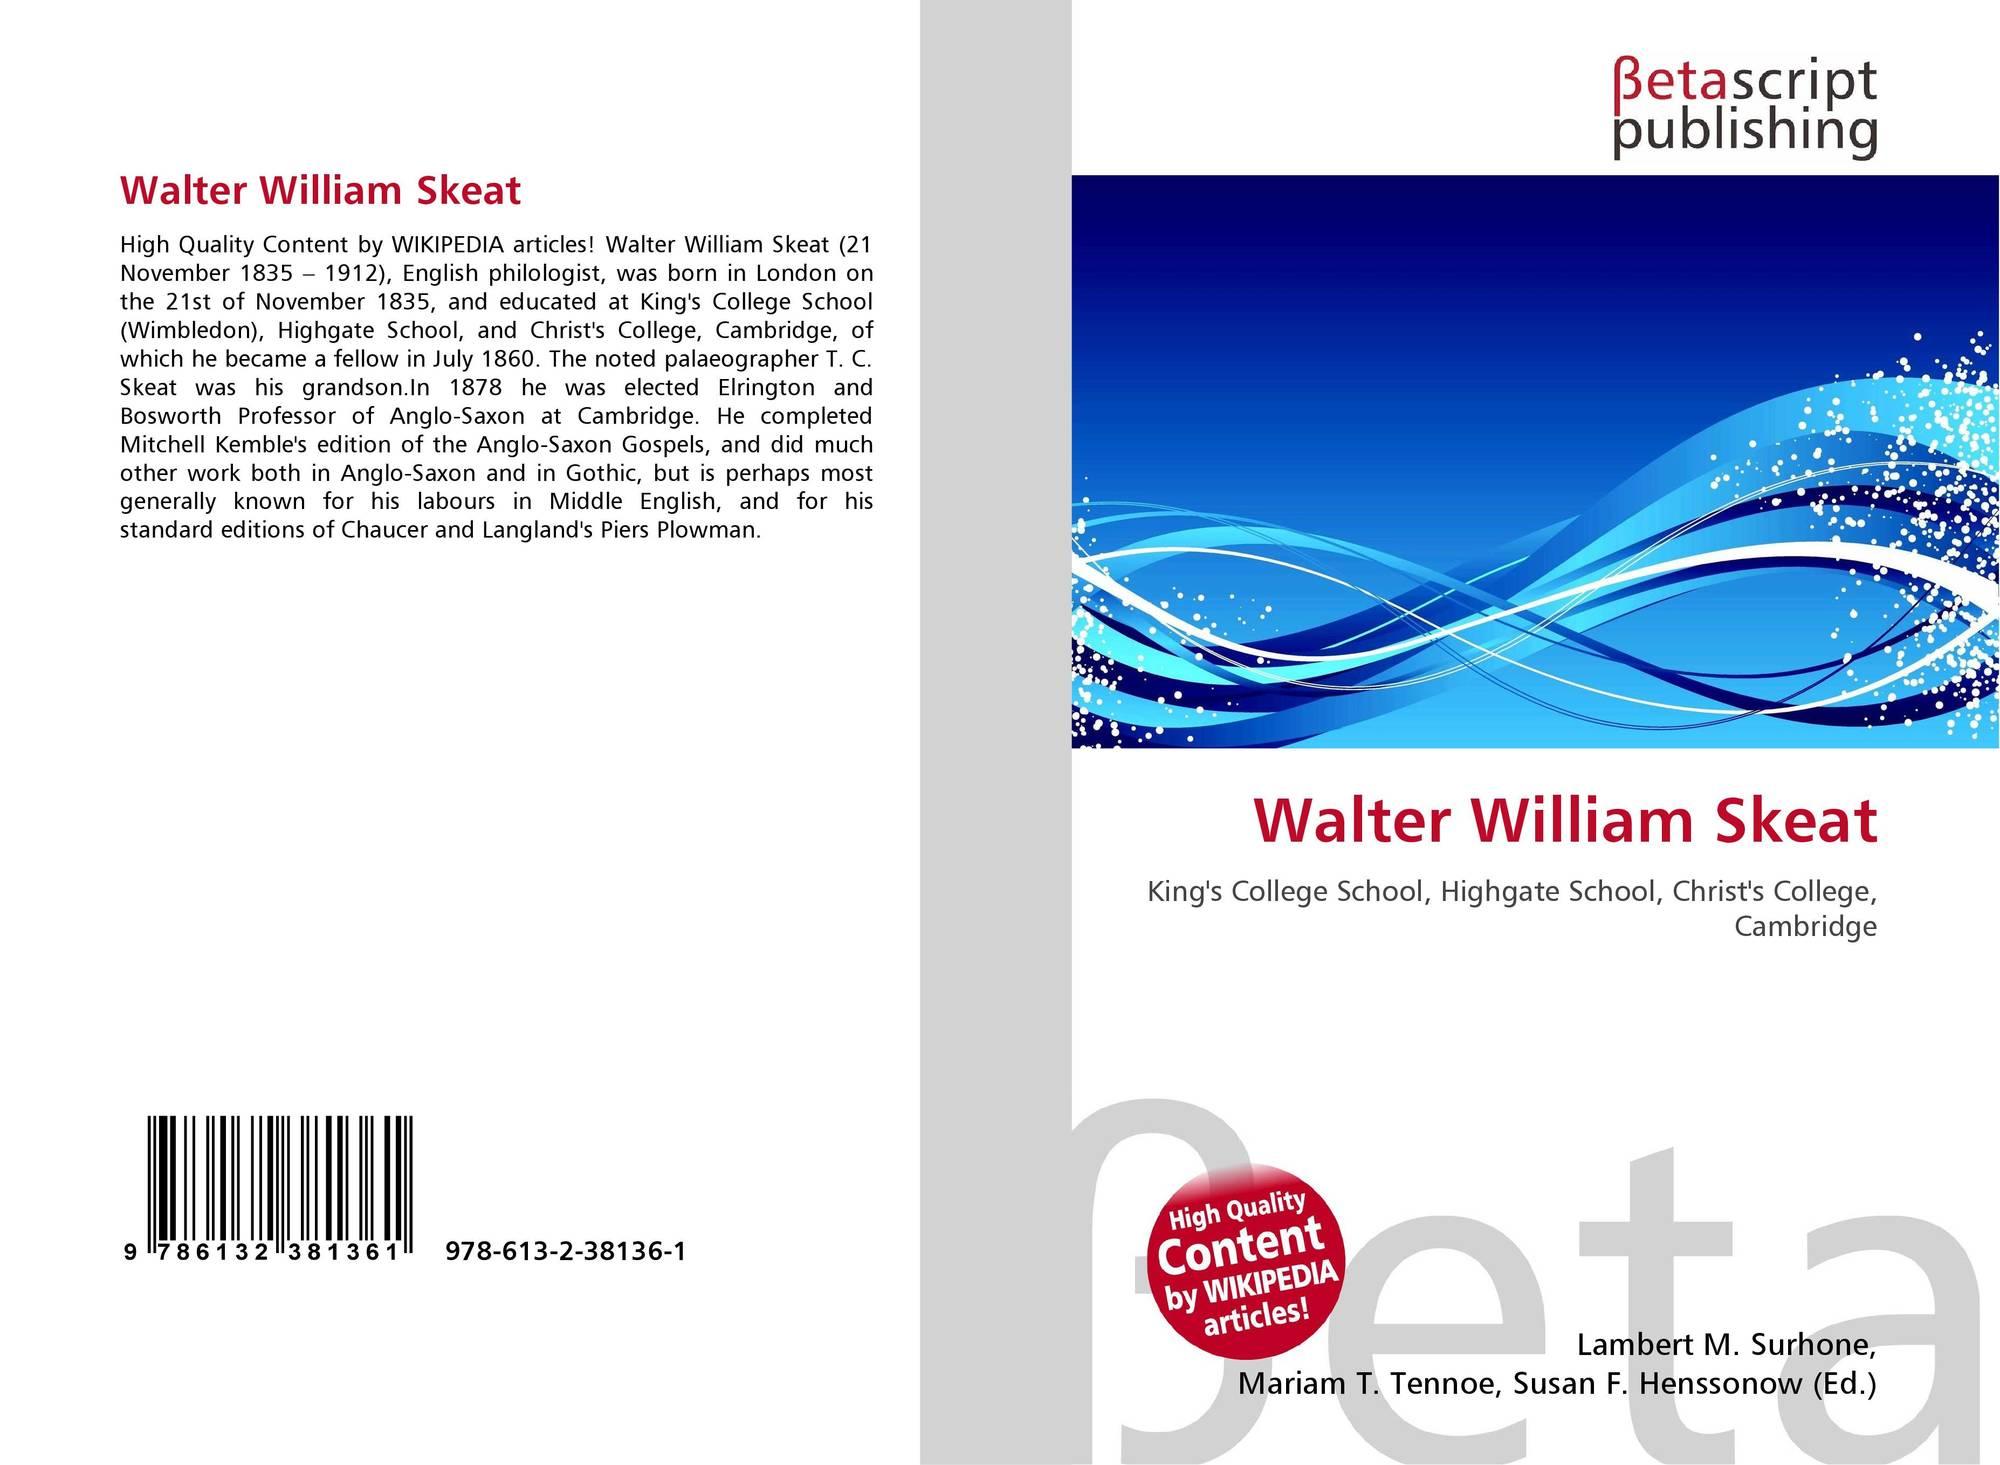 Walter William Sache: 所有类别 语言学和文学